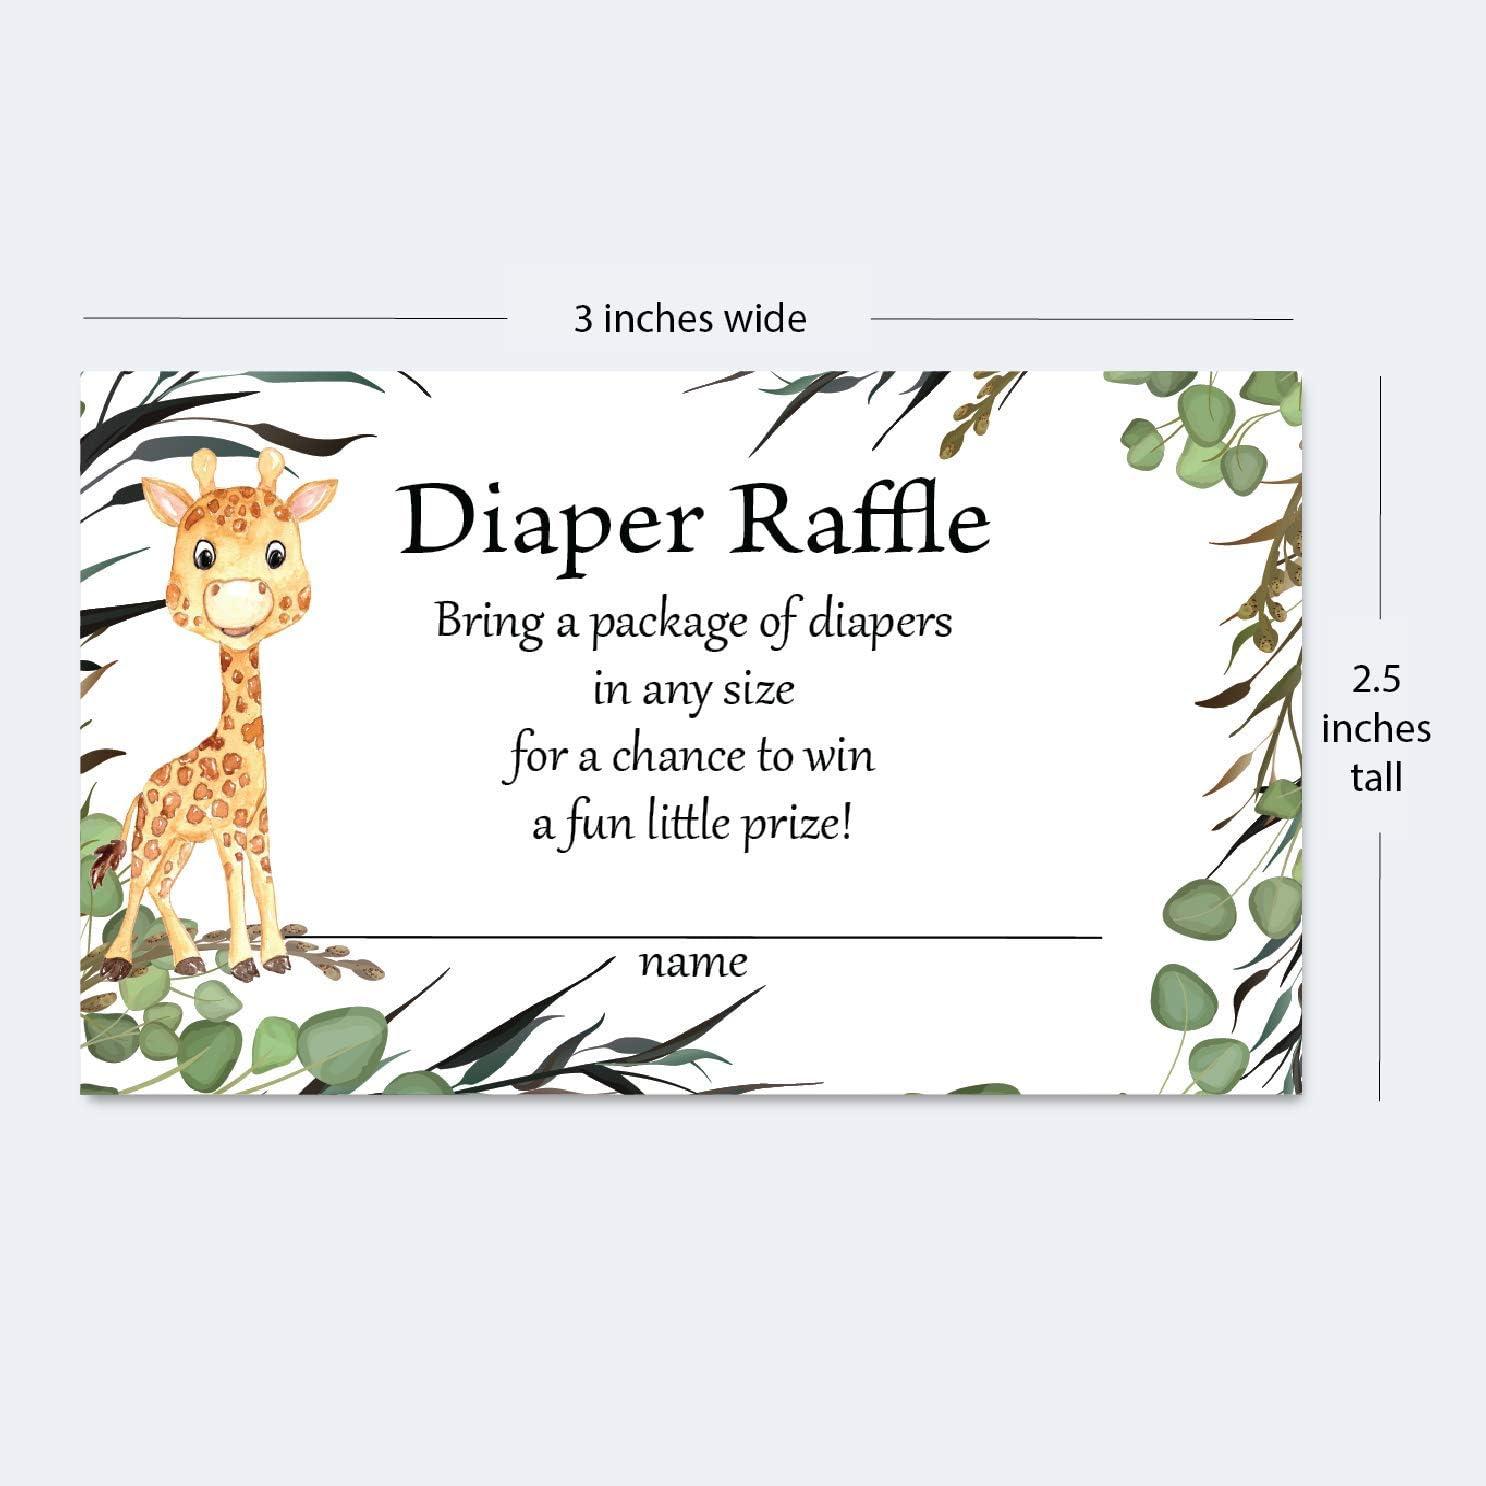 Diaper Raffle Cards Covid Shower Template Safari Diaper Raffle Sign Masked Animals Diaper Raffle Cards WLP-MAS 3837 TEMPLETT